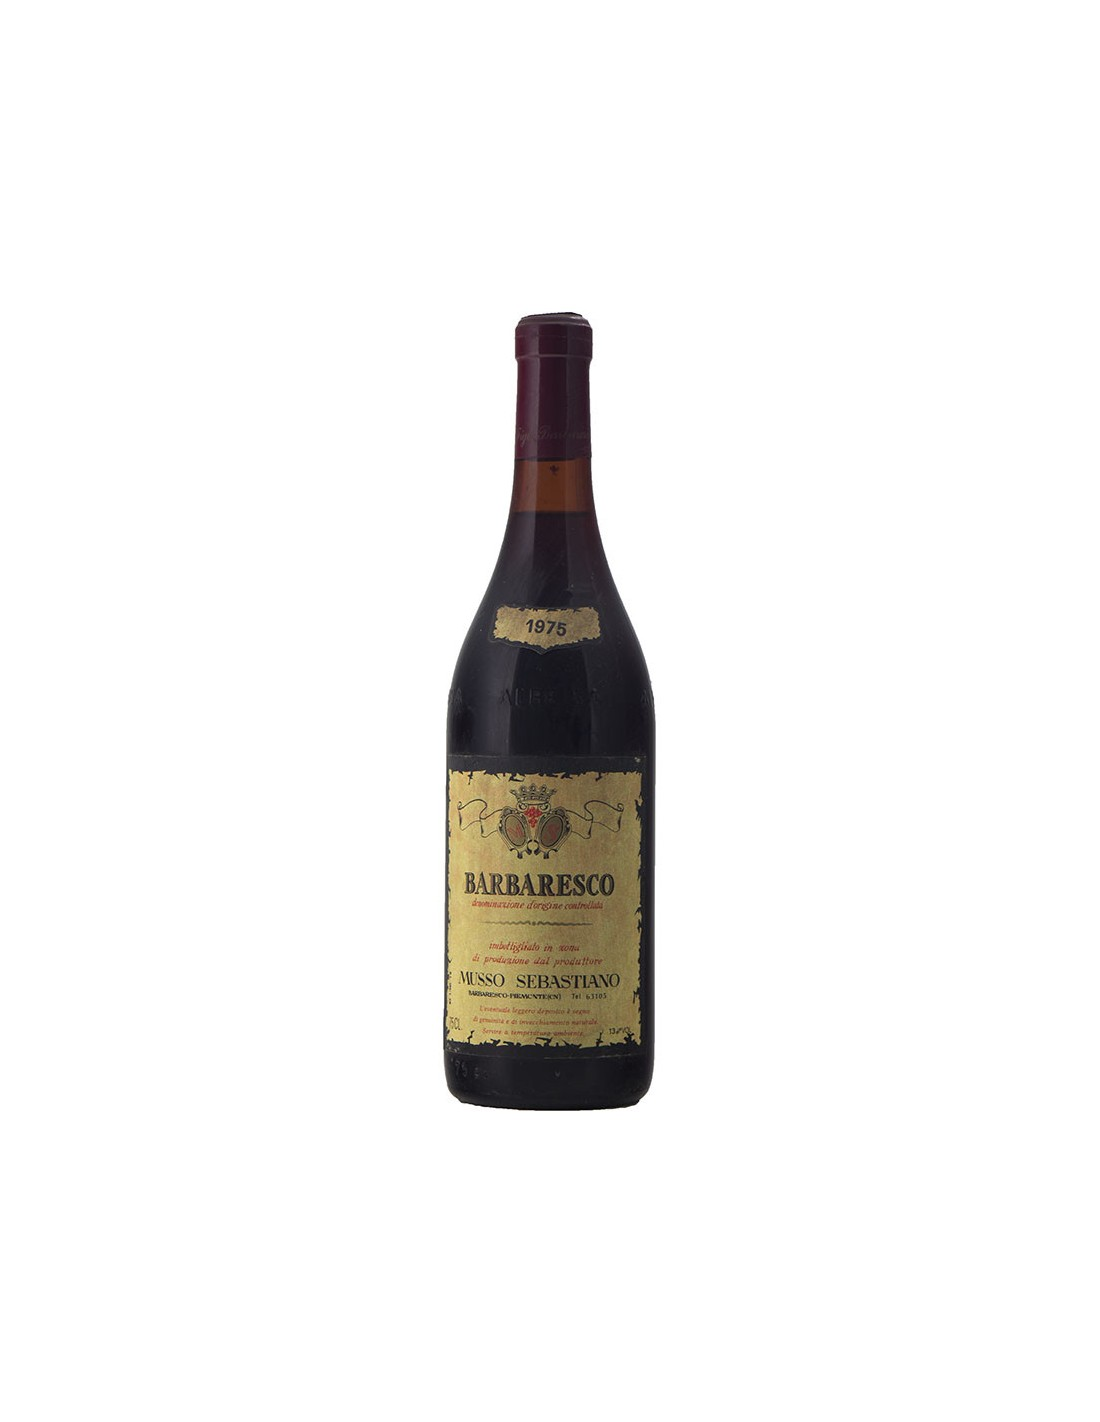 BARBARESCO 1975 MUSSO Grandi Bottiglie